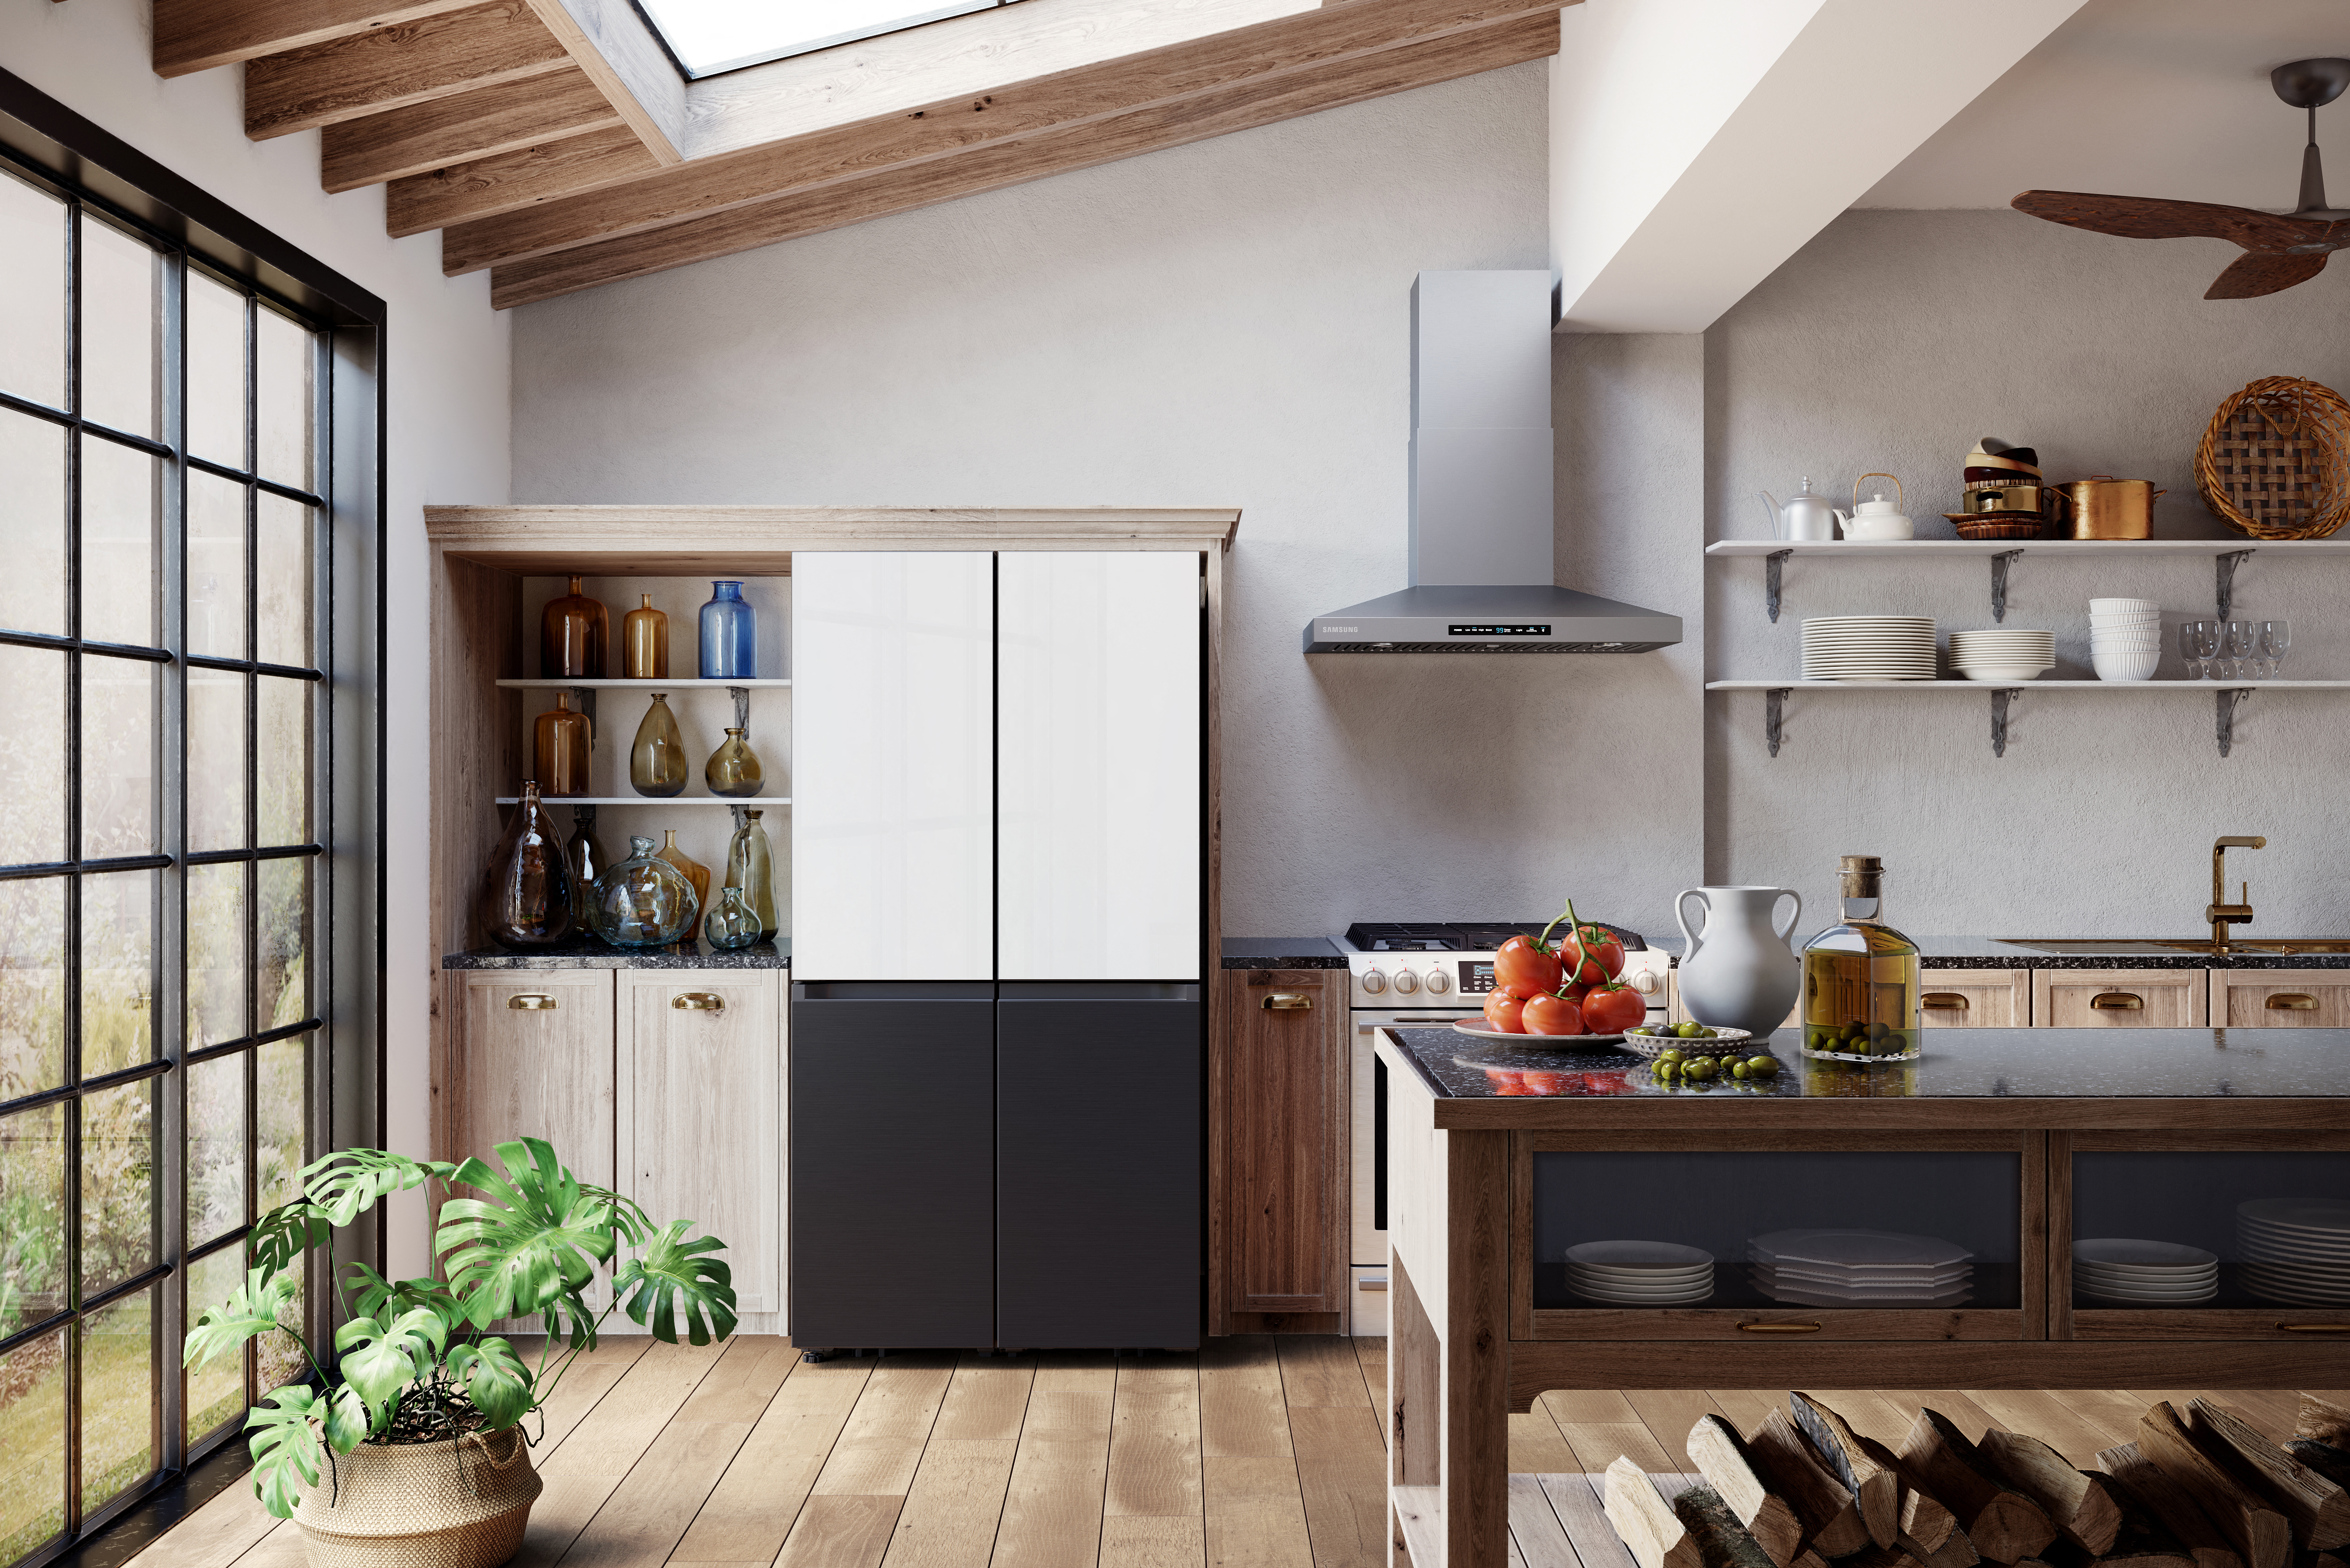 BESPOKE refrigerator